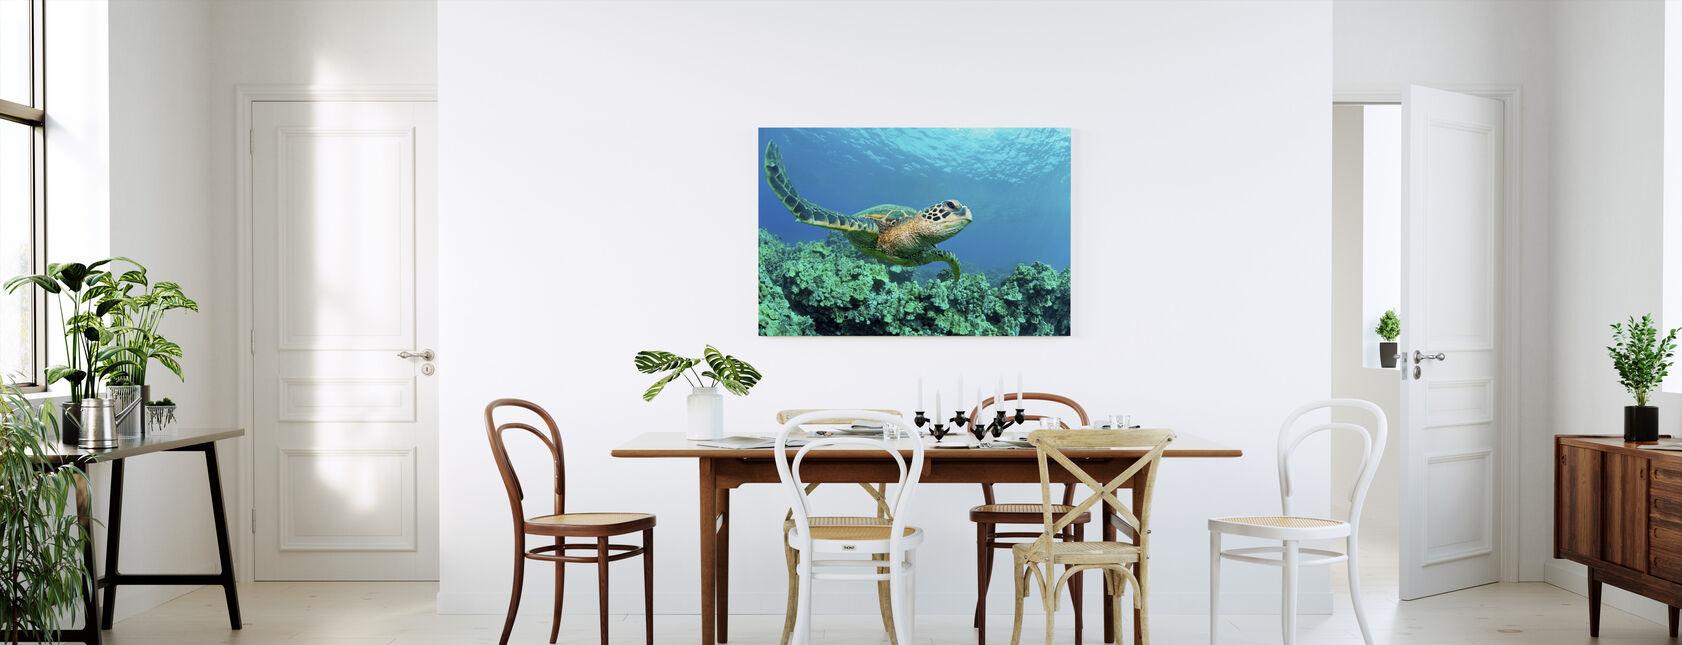 Sea Turtle in Coral - Canvas print - Kitchen